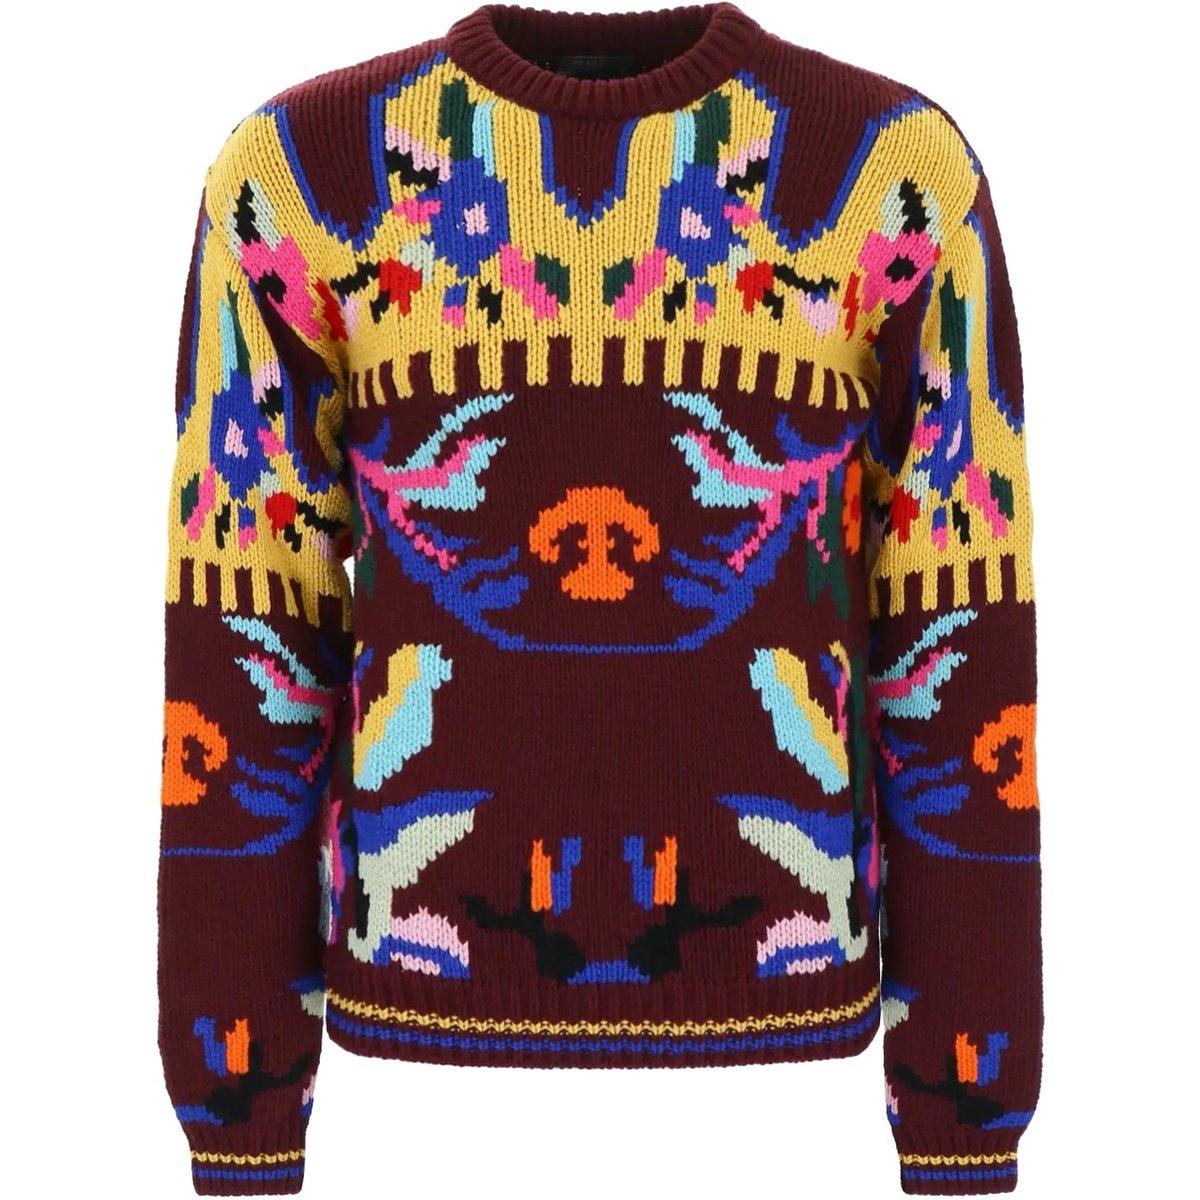 Prada intarsia sweater copy.jpg